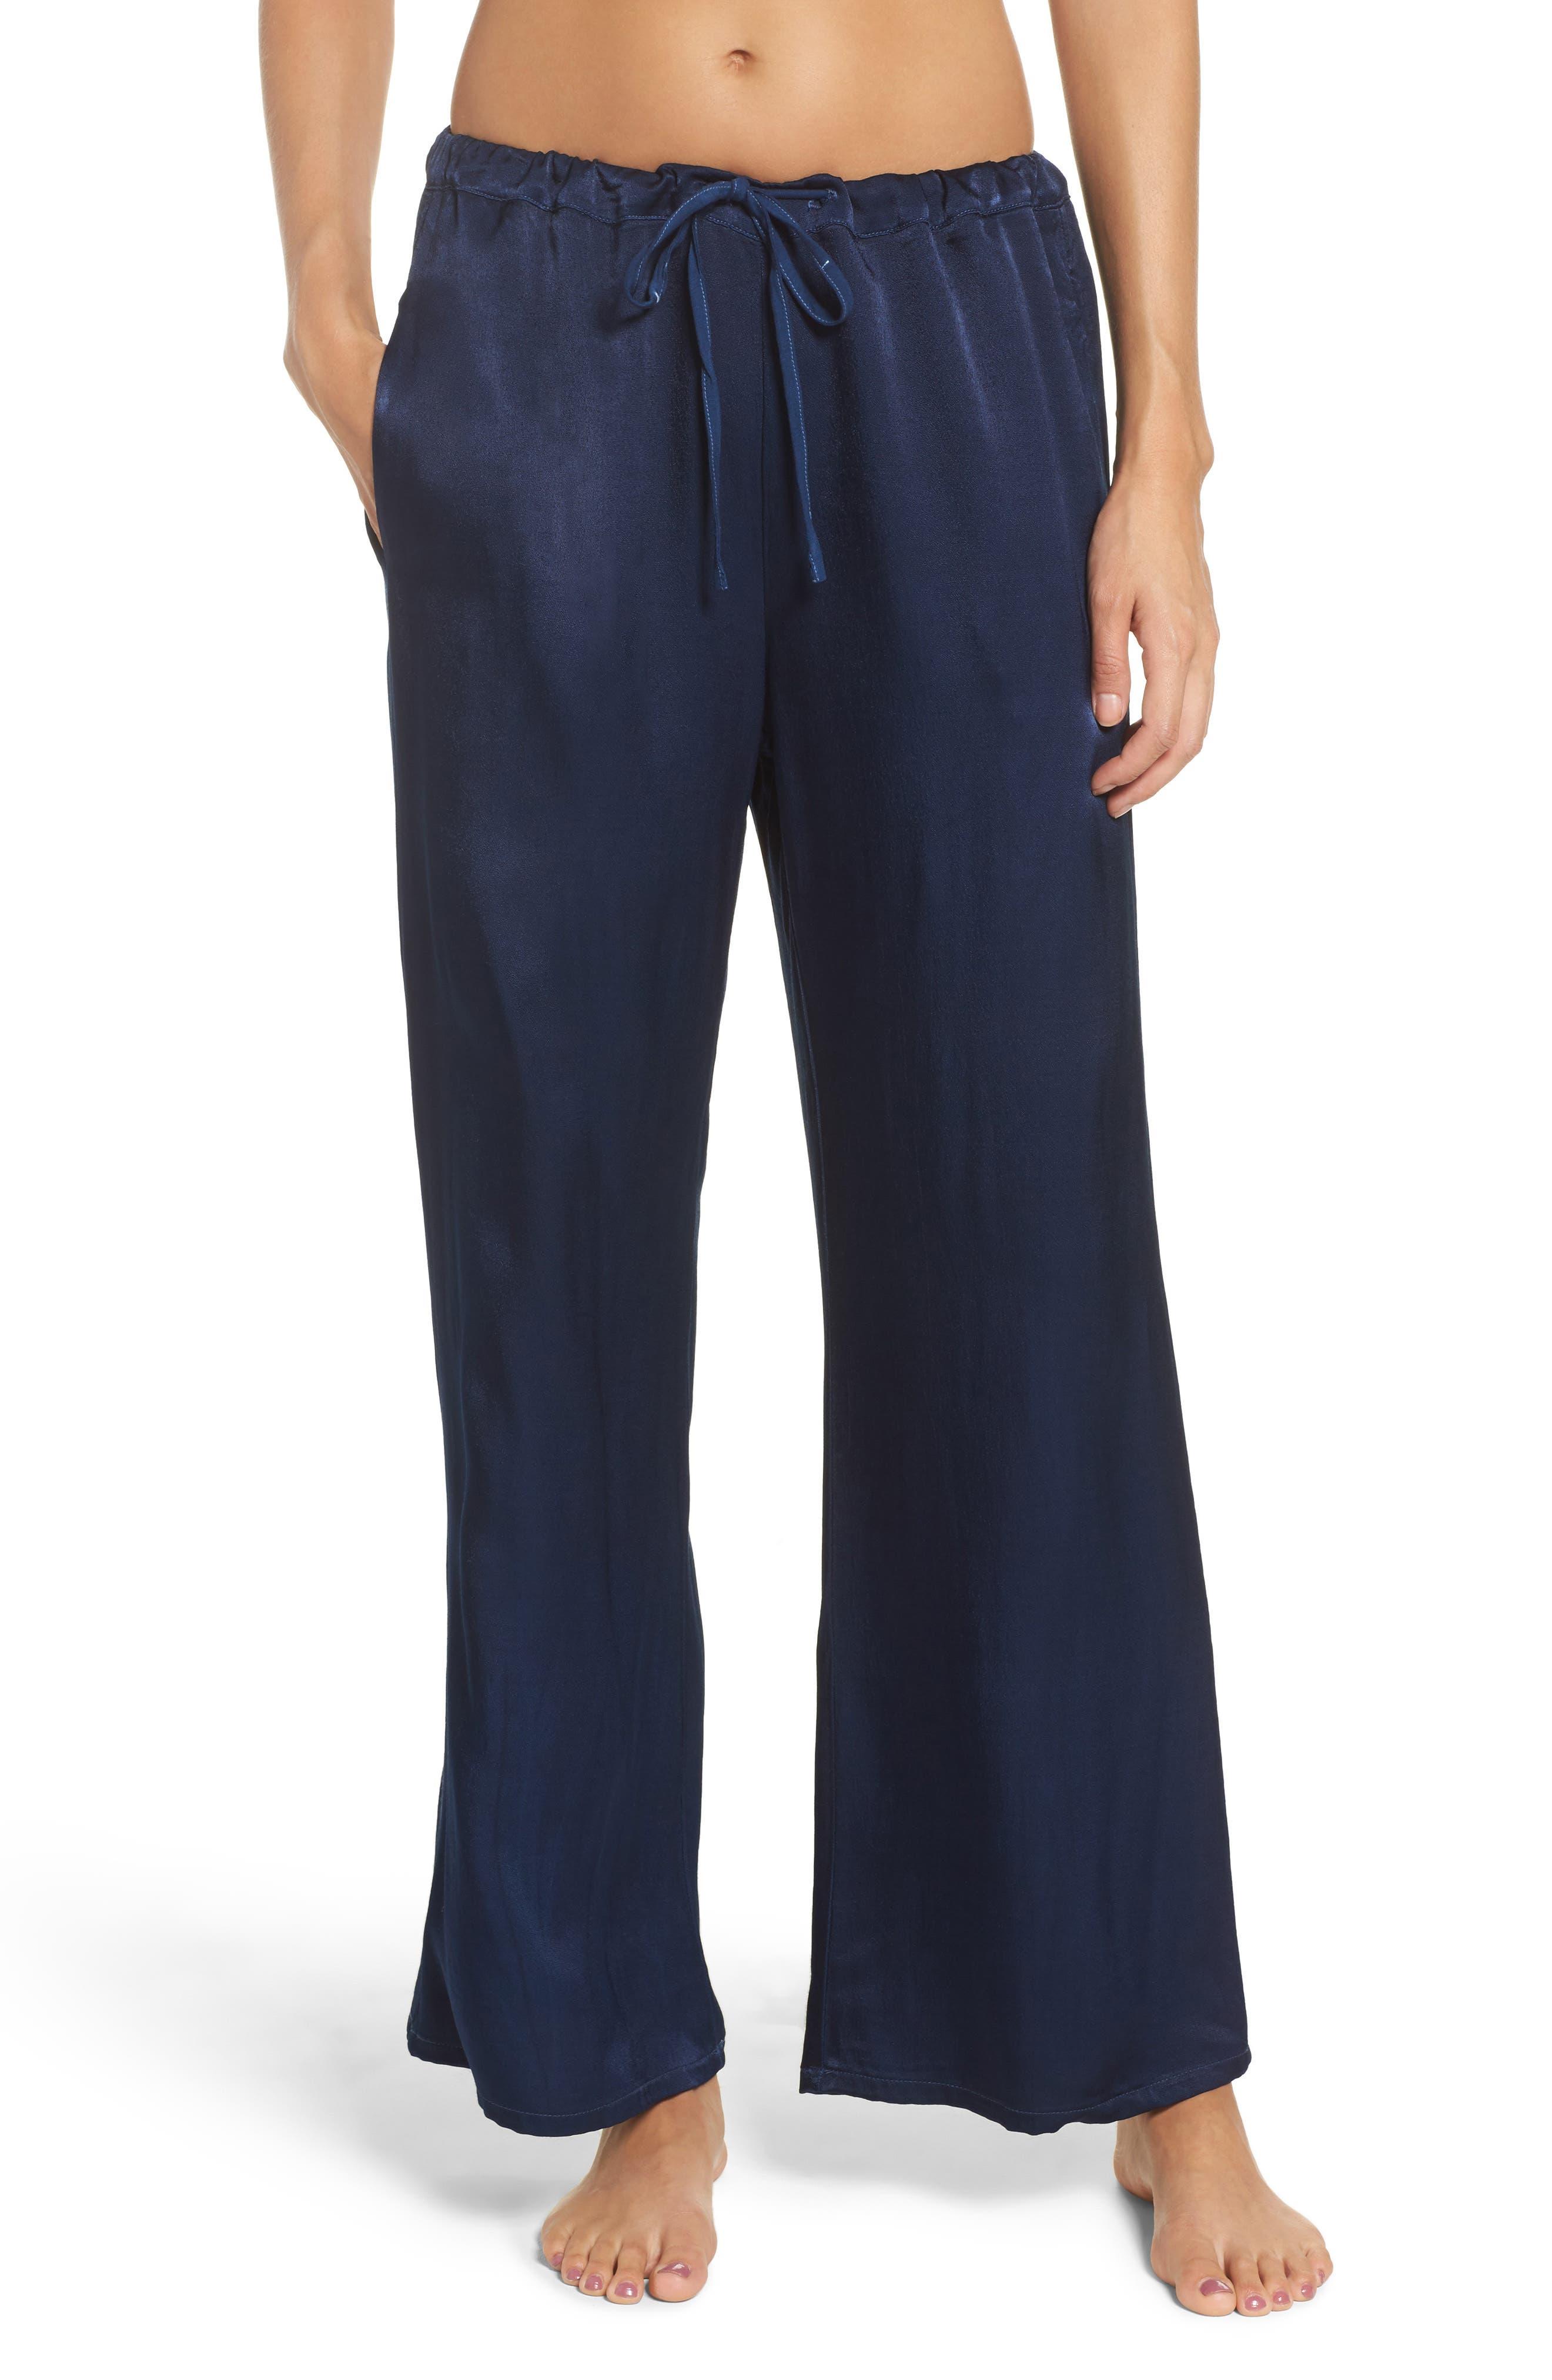 Vela Pajama Pants,                             Main thumbnail 1, color,                             Oxford